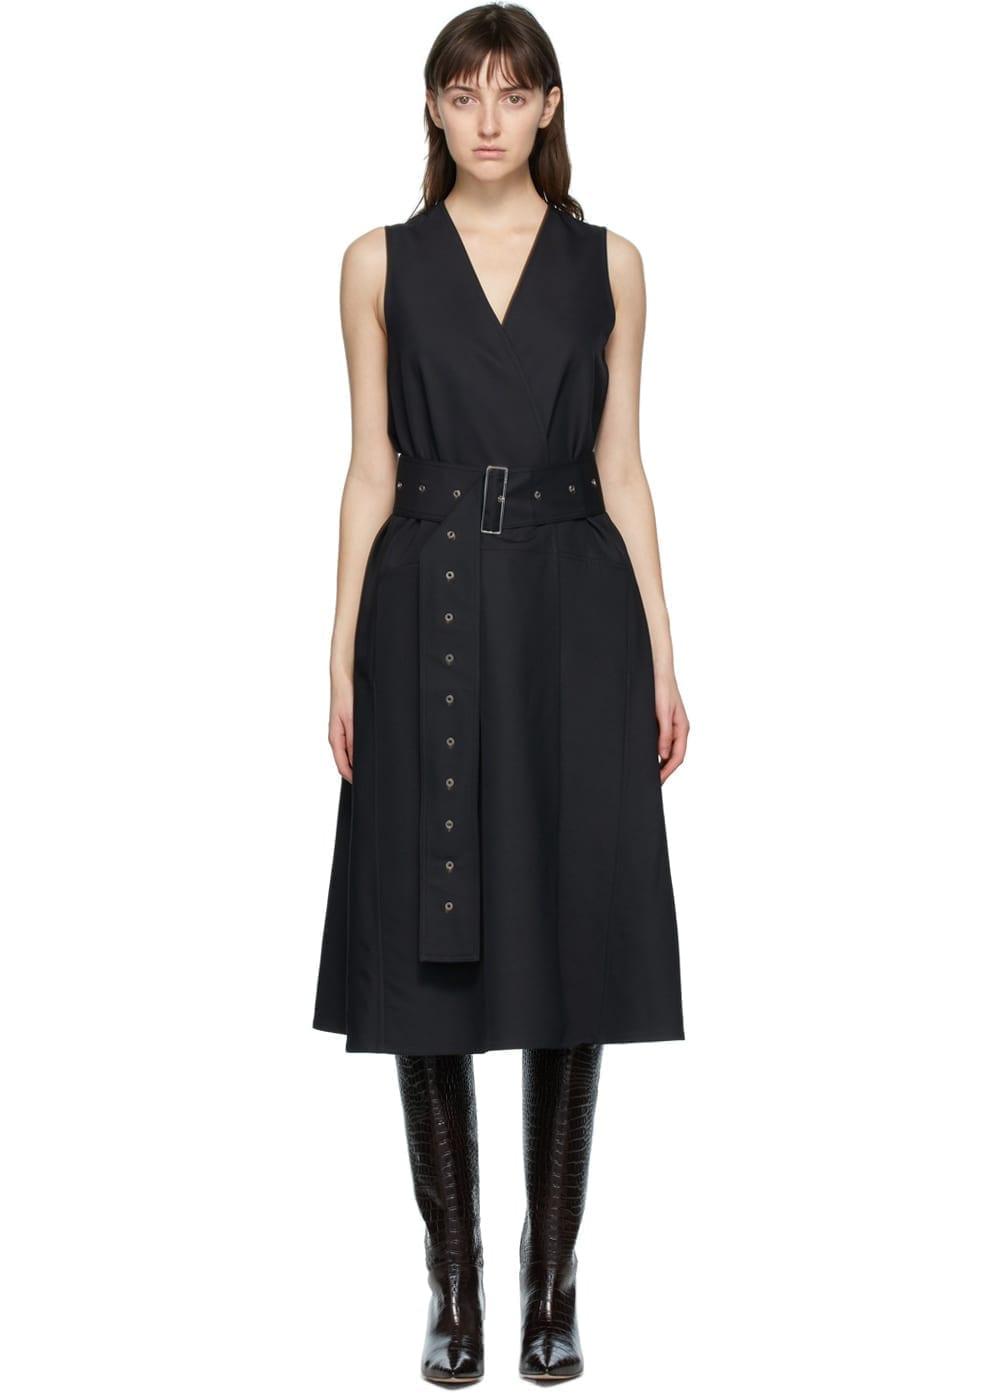 JOSEPH Black Wool Dorail Faille Belted Dress